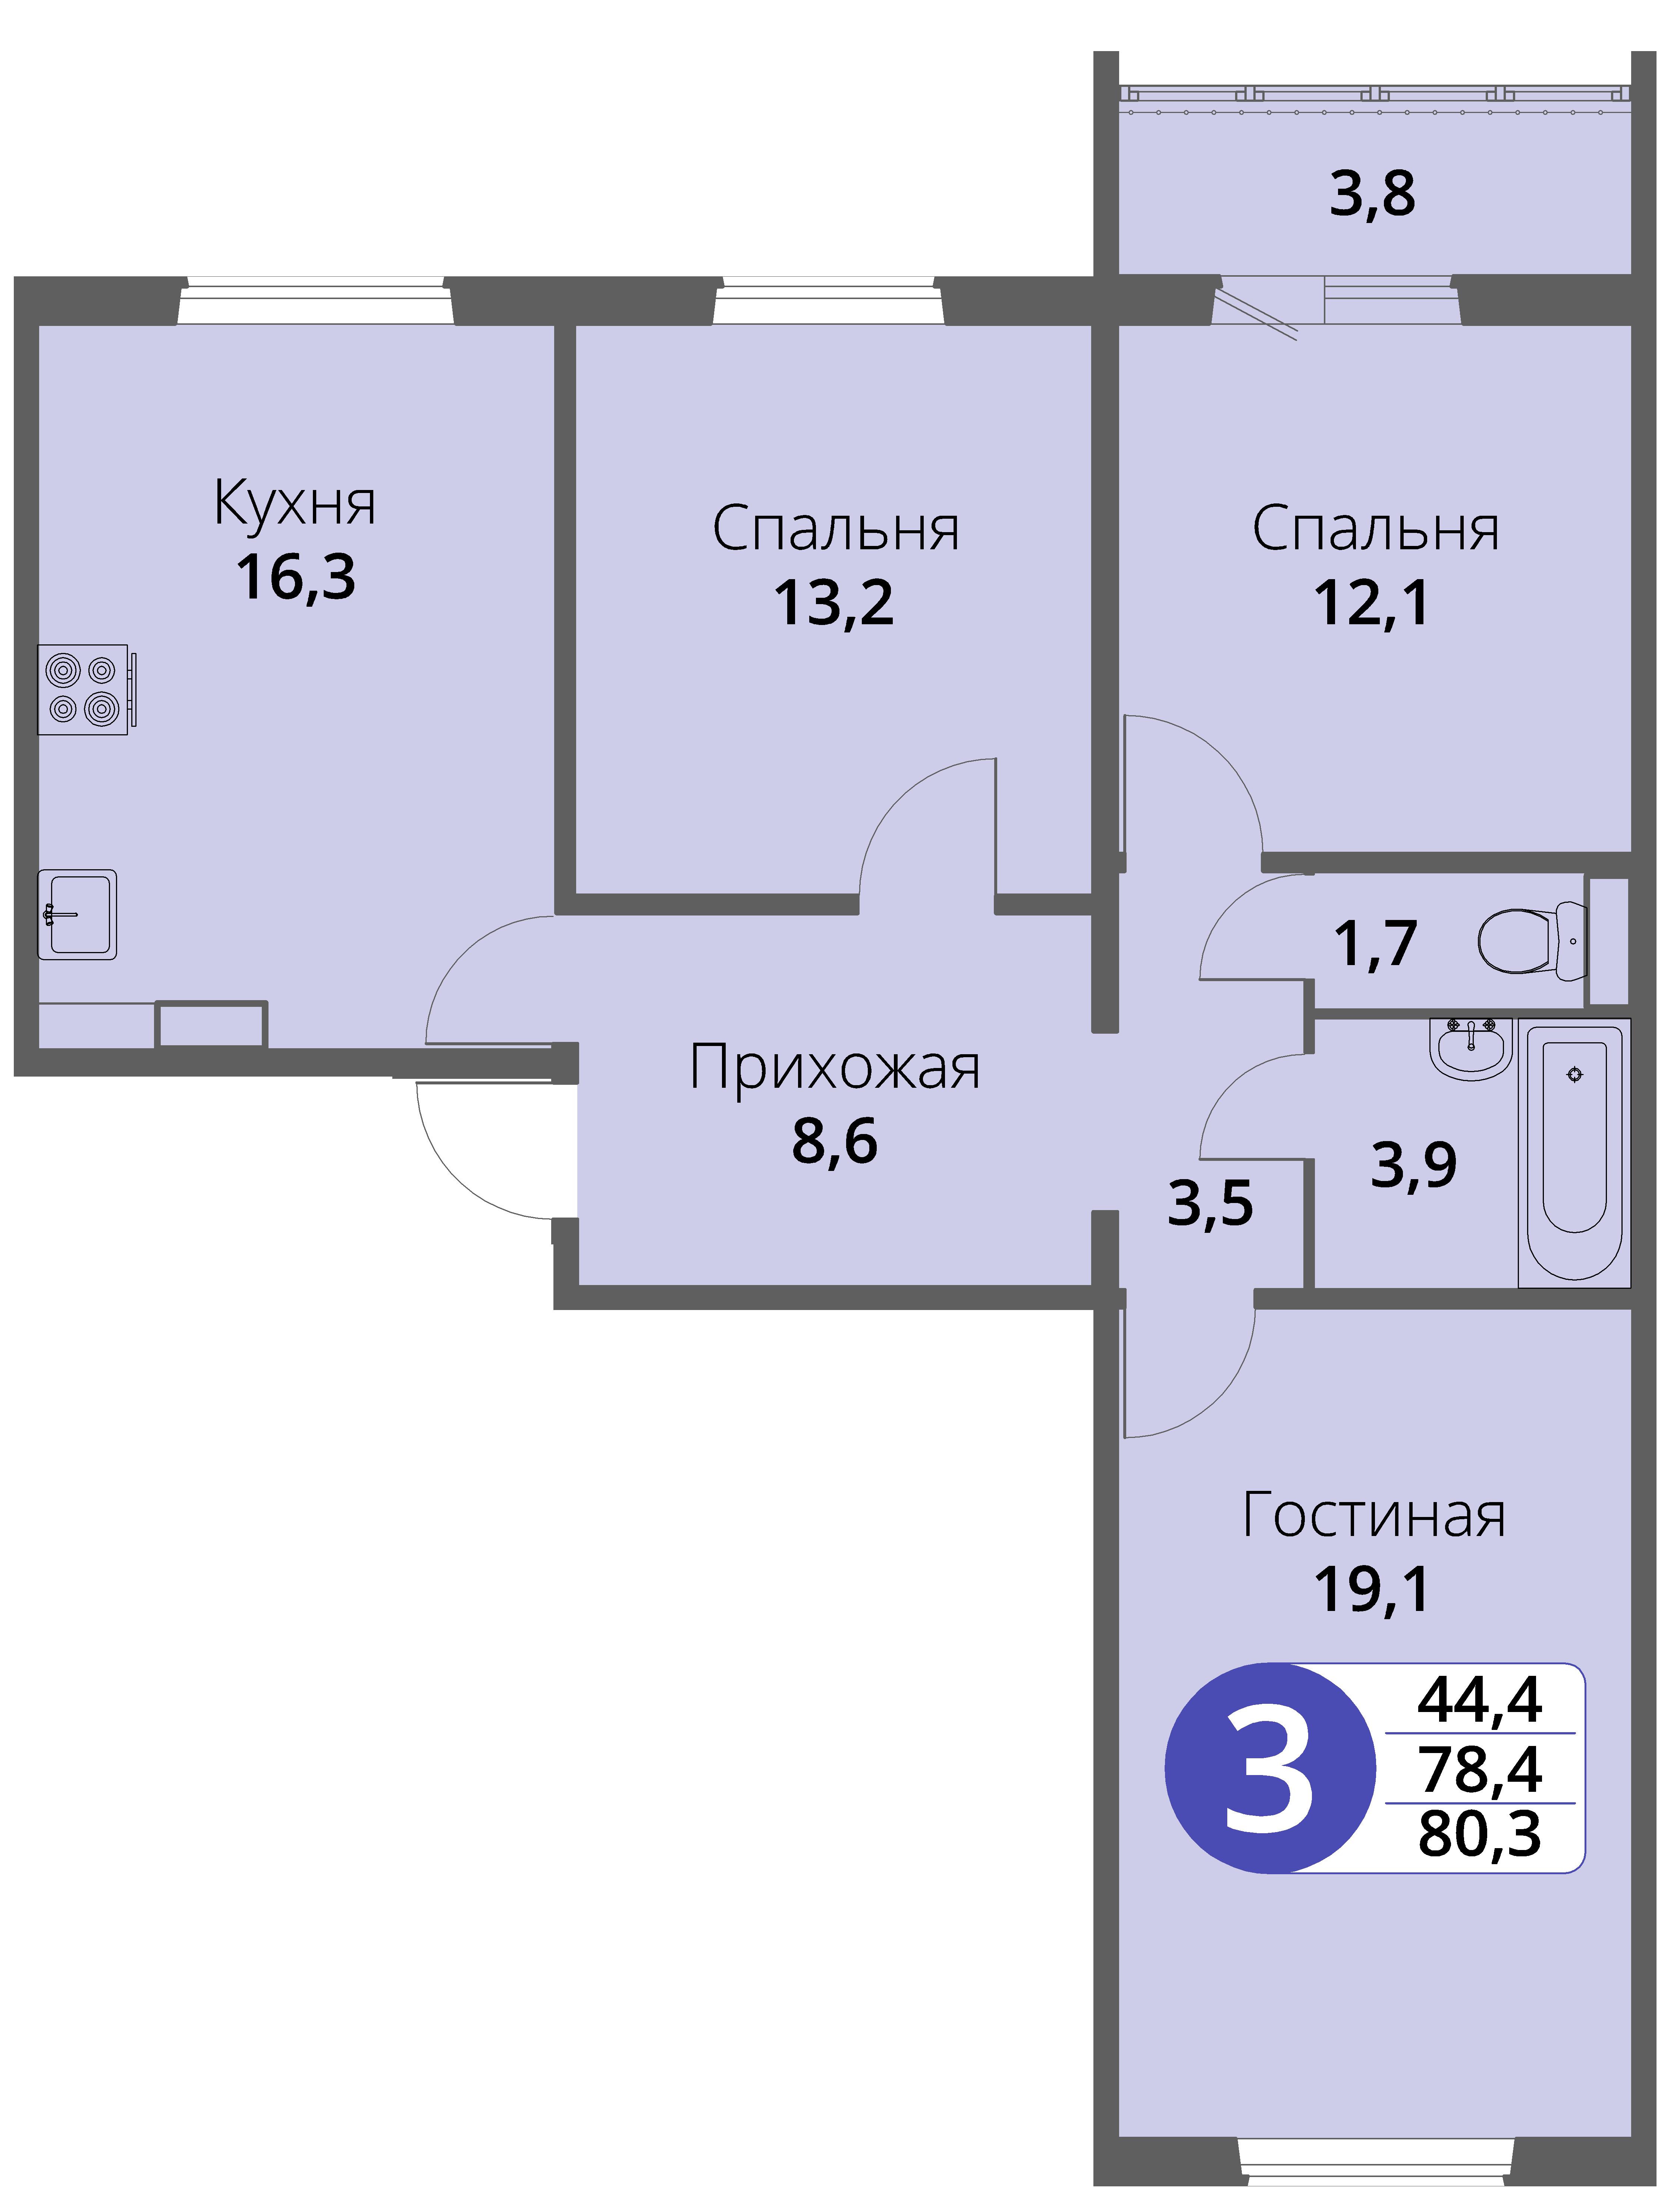 Зареченская 1-2, квартира 131 - Трехкомнатная